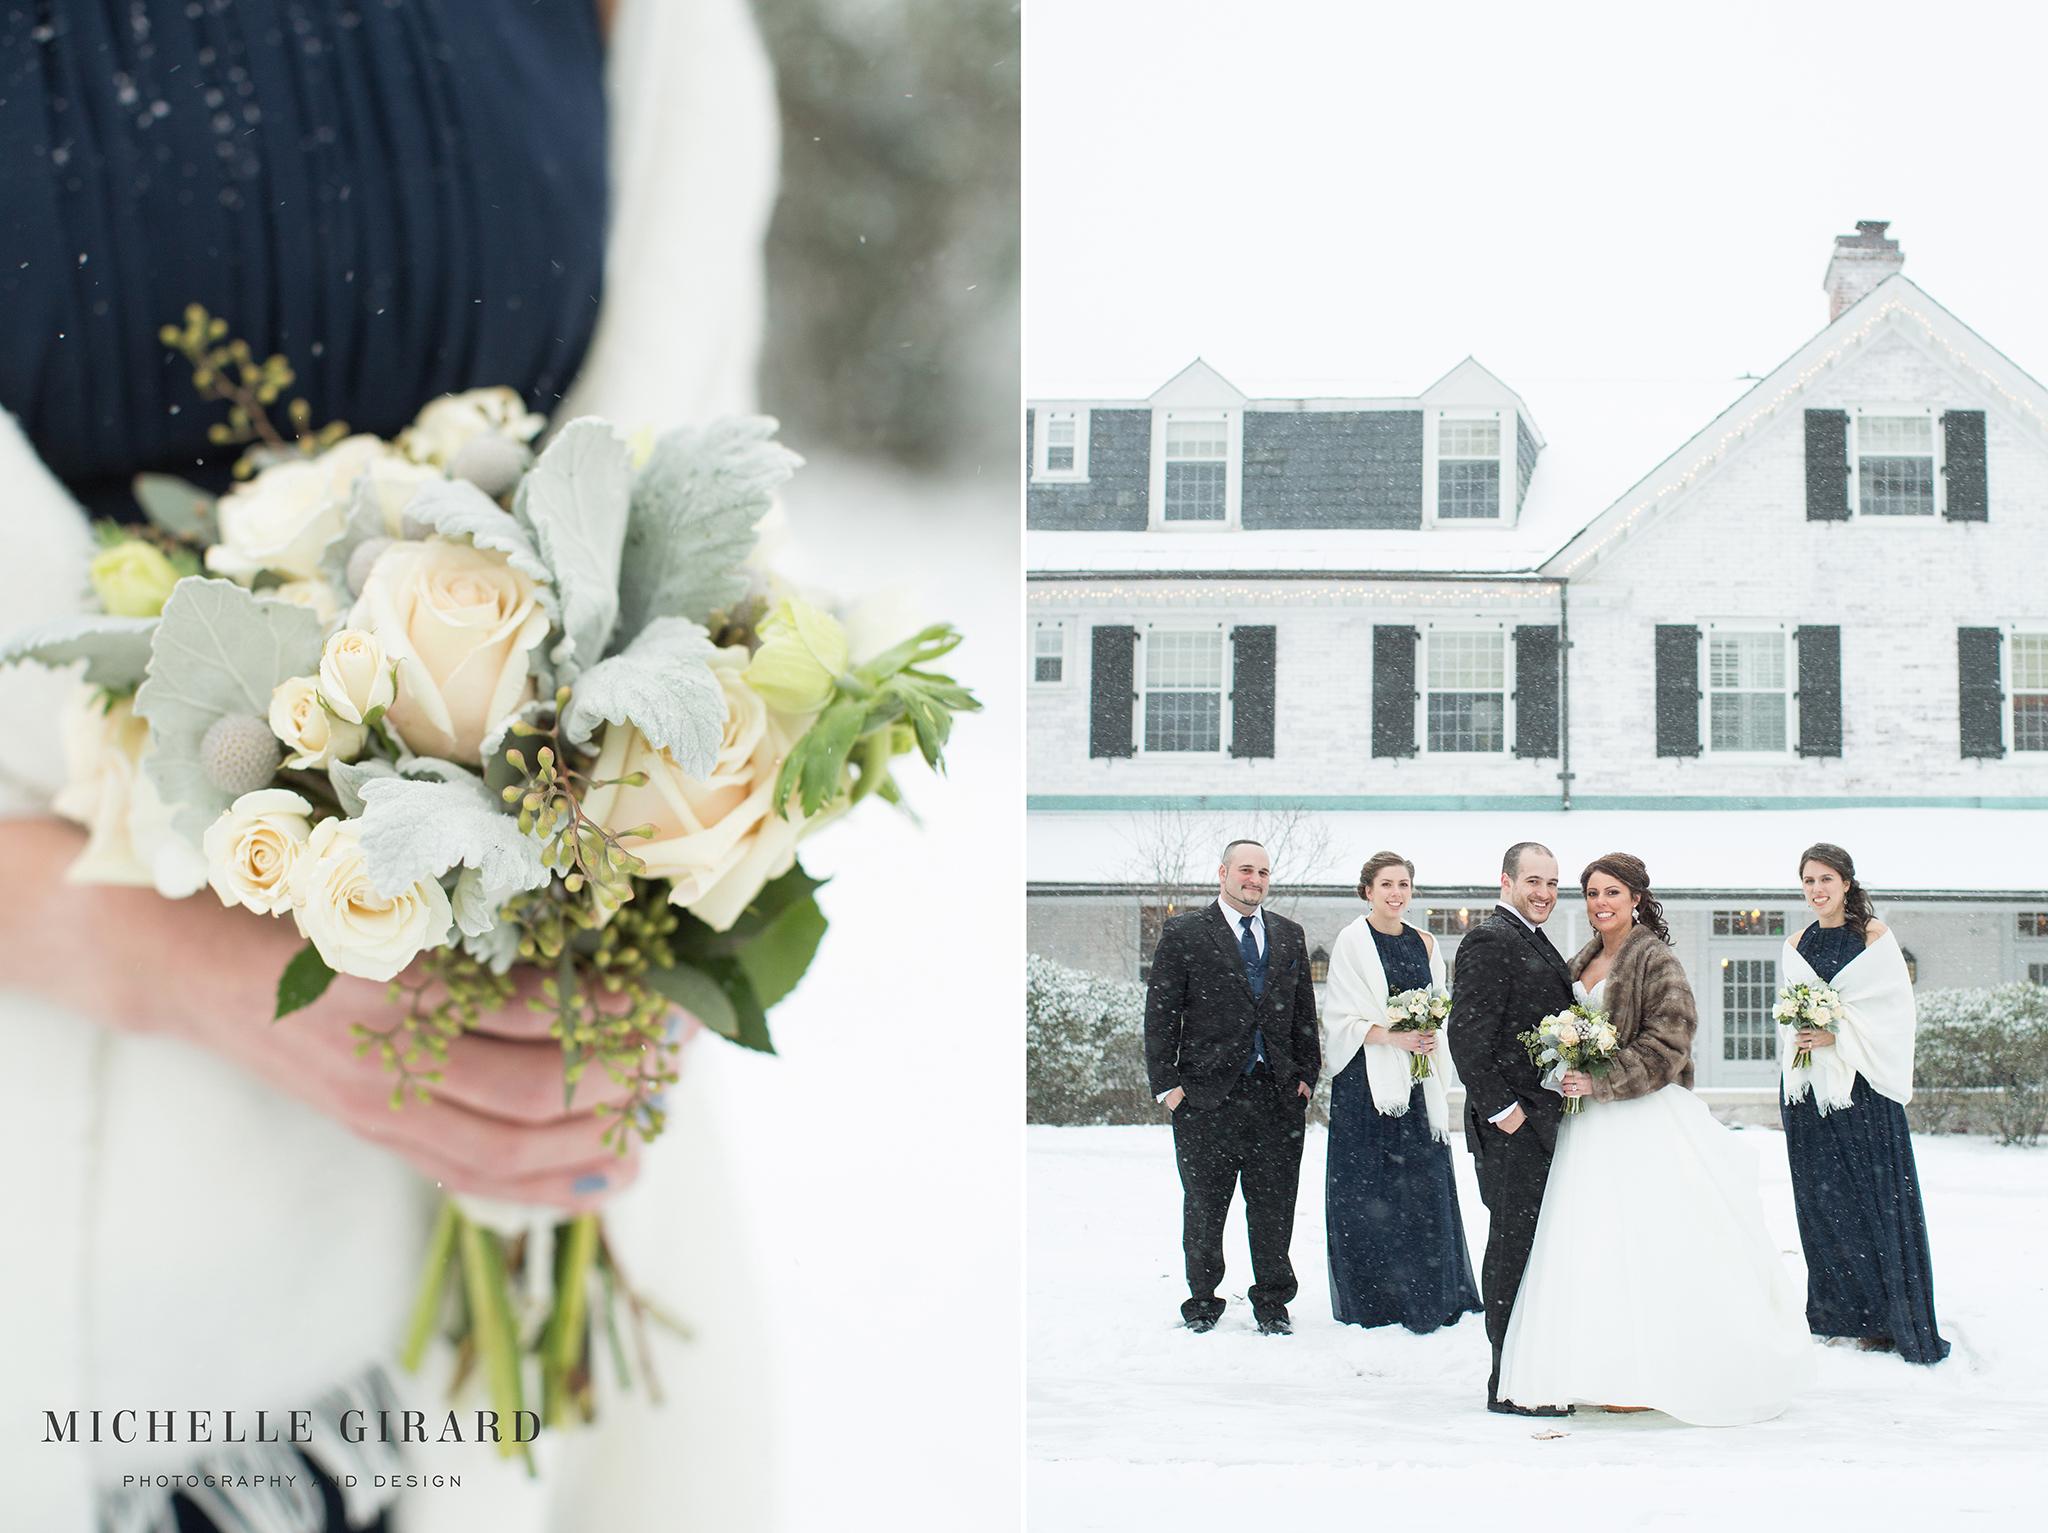 WinterWedding_LordJefferyInn_AmherstMA_MichelleGirardPhotography02.jpg